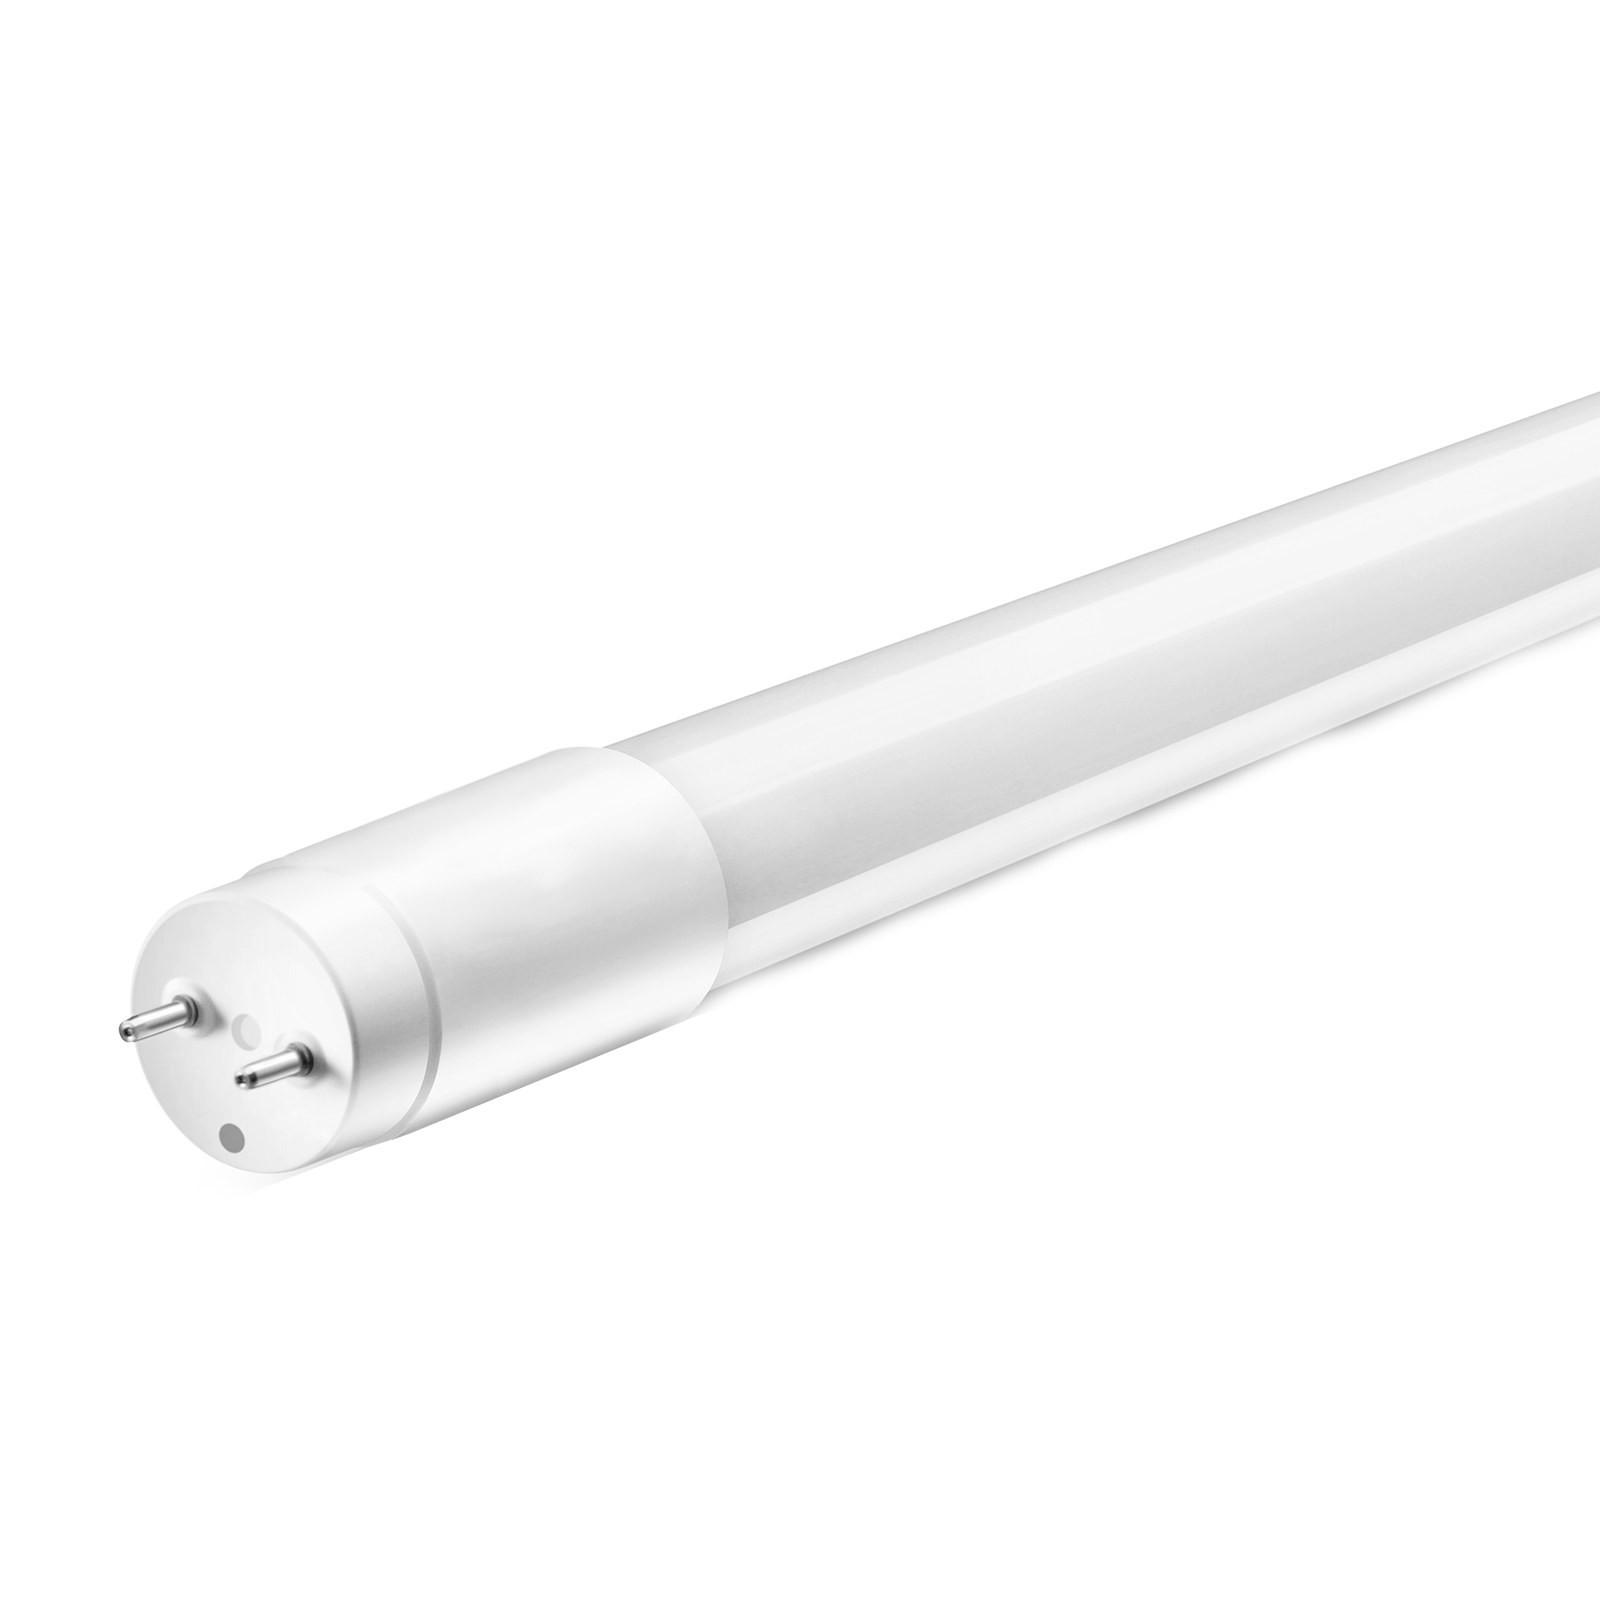 Neon tubo led smd t8 luce bianca fredda 120cm life 18 watt for Luce bianca led